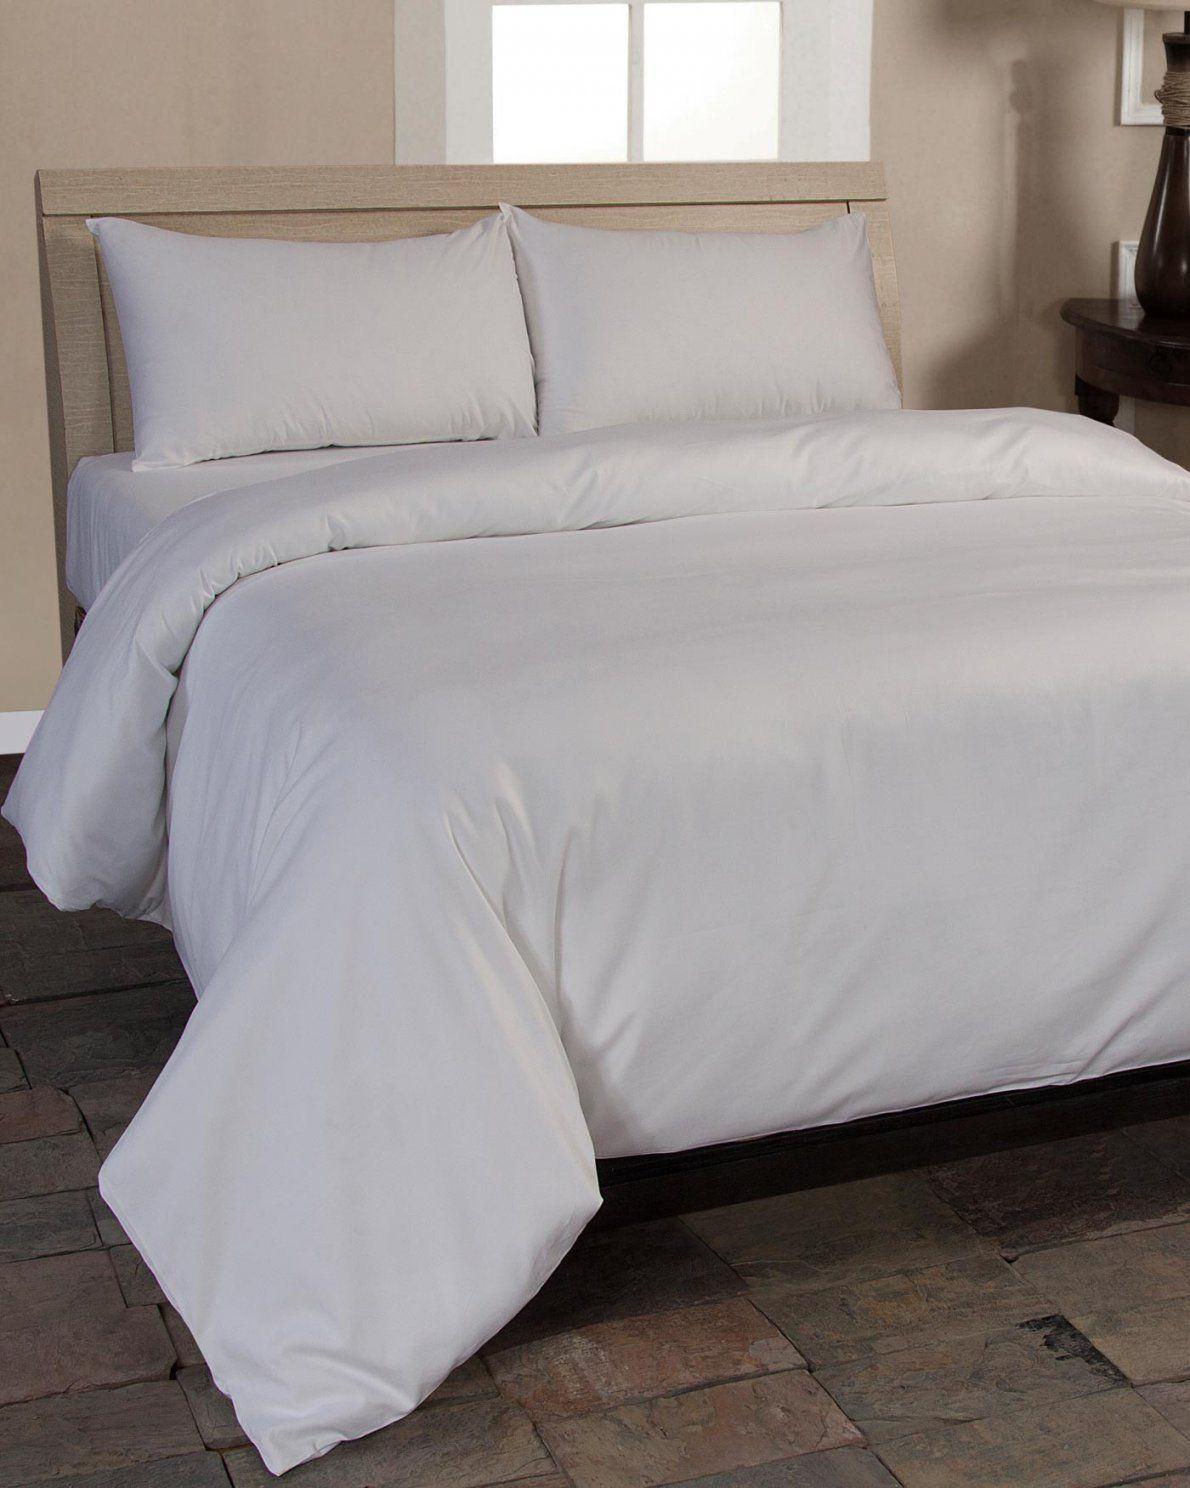 bio bettw sche 200x200 haus design ideen. Black Bedroom Furniture Sets. Home Design Ideas